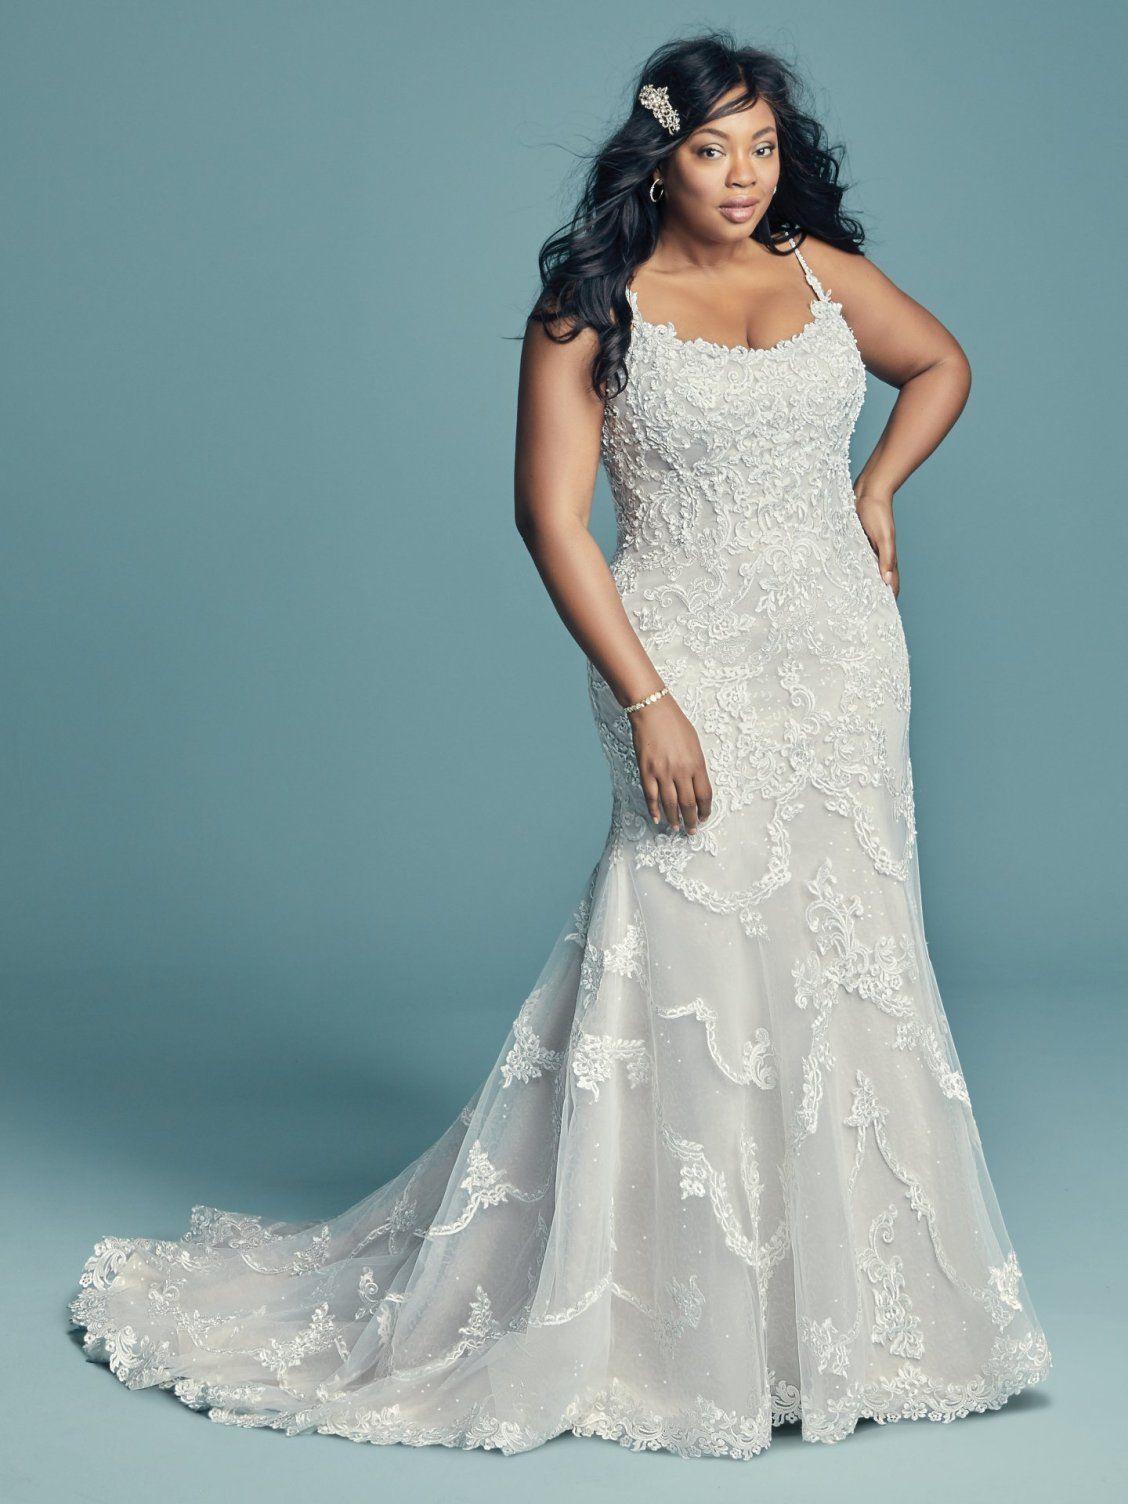 Wedding Dresses Bridal Gowns Plus Size Wedding Gowns Wedding Dresses Curvy Wedding Dress [ 1504 x 1128 Pixel ]